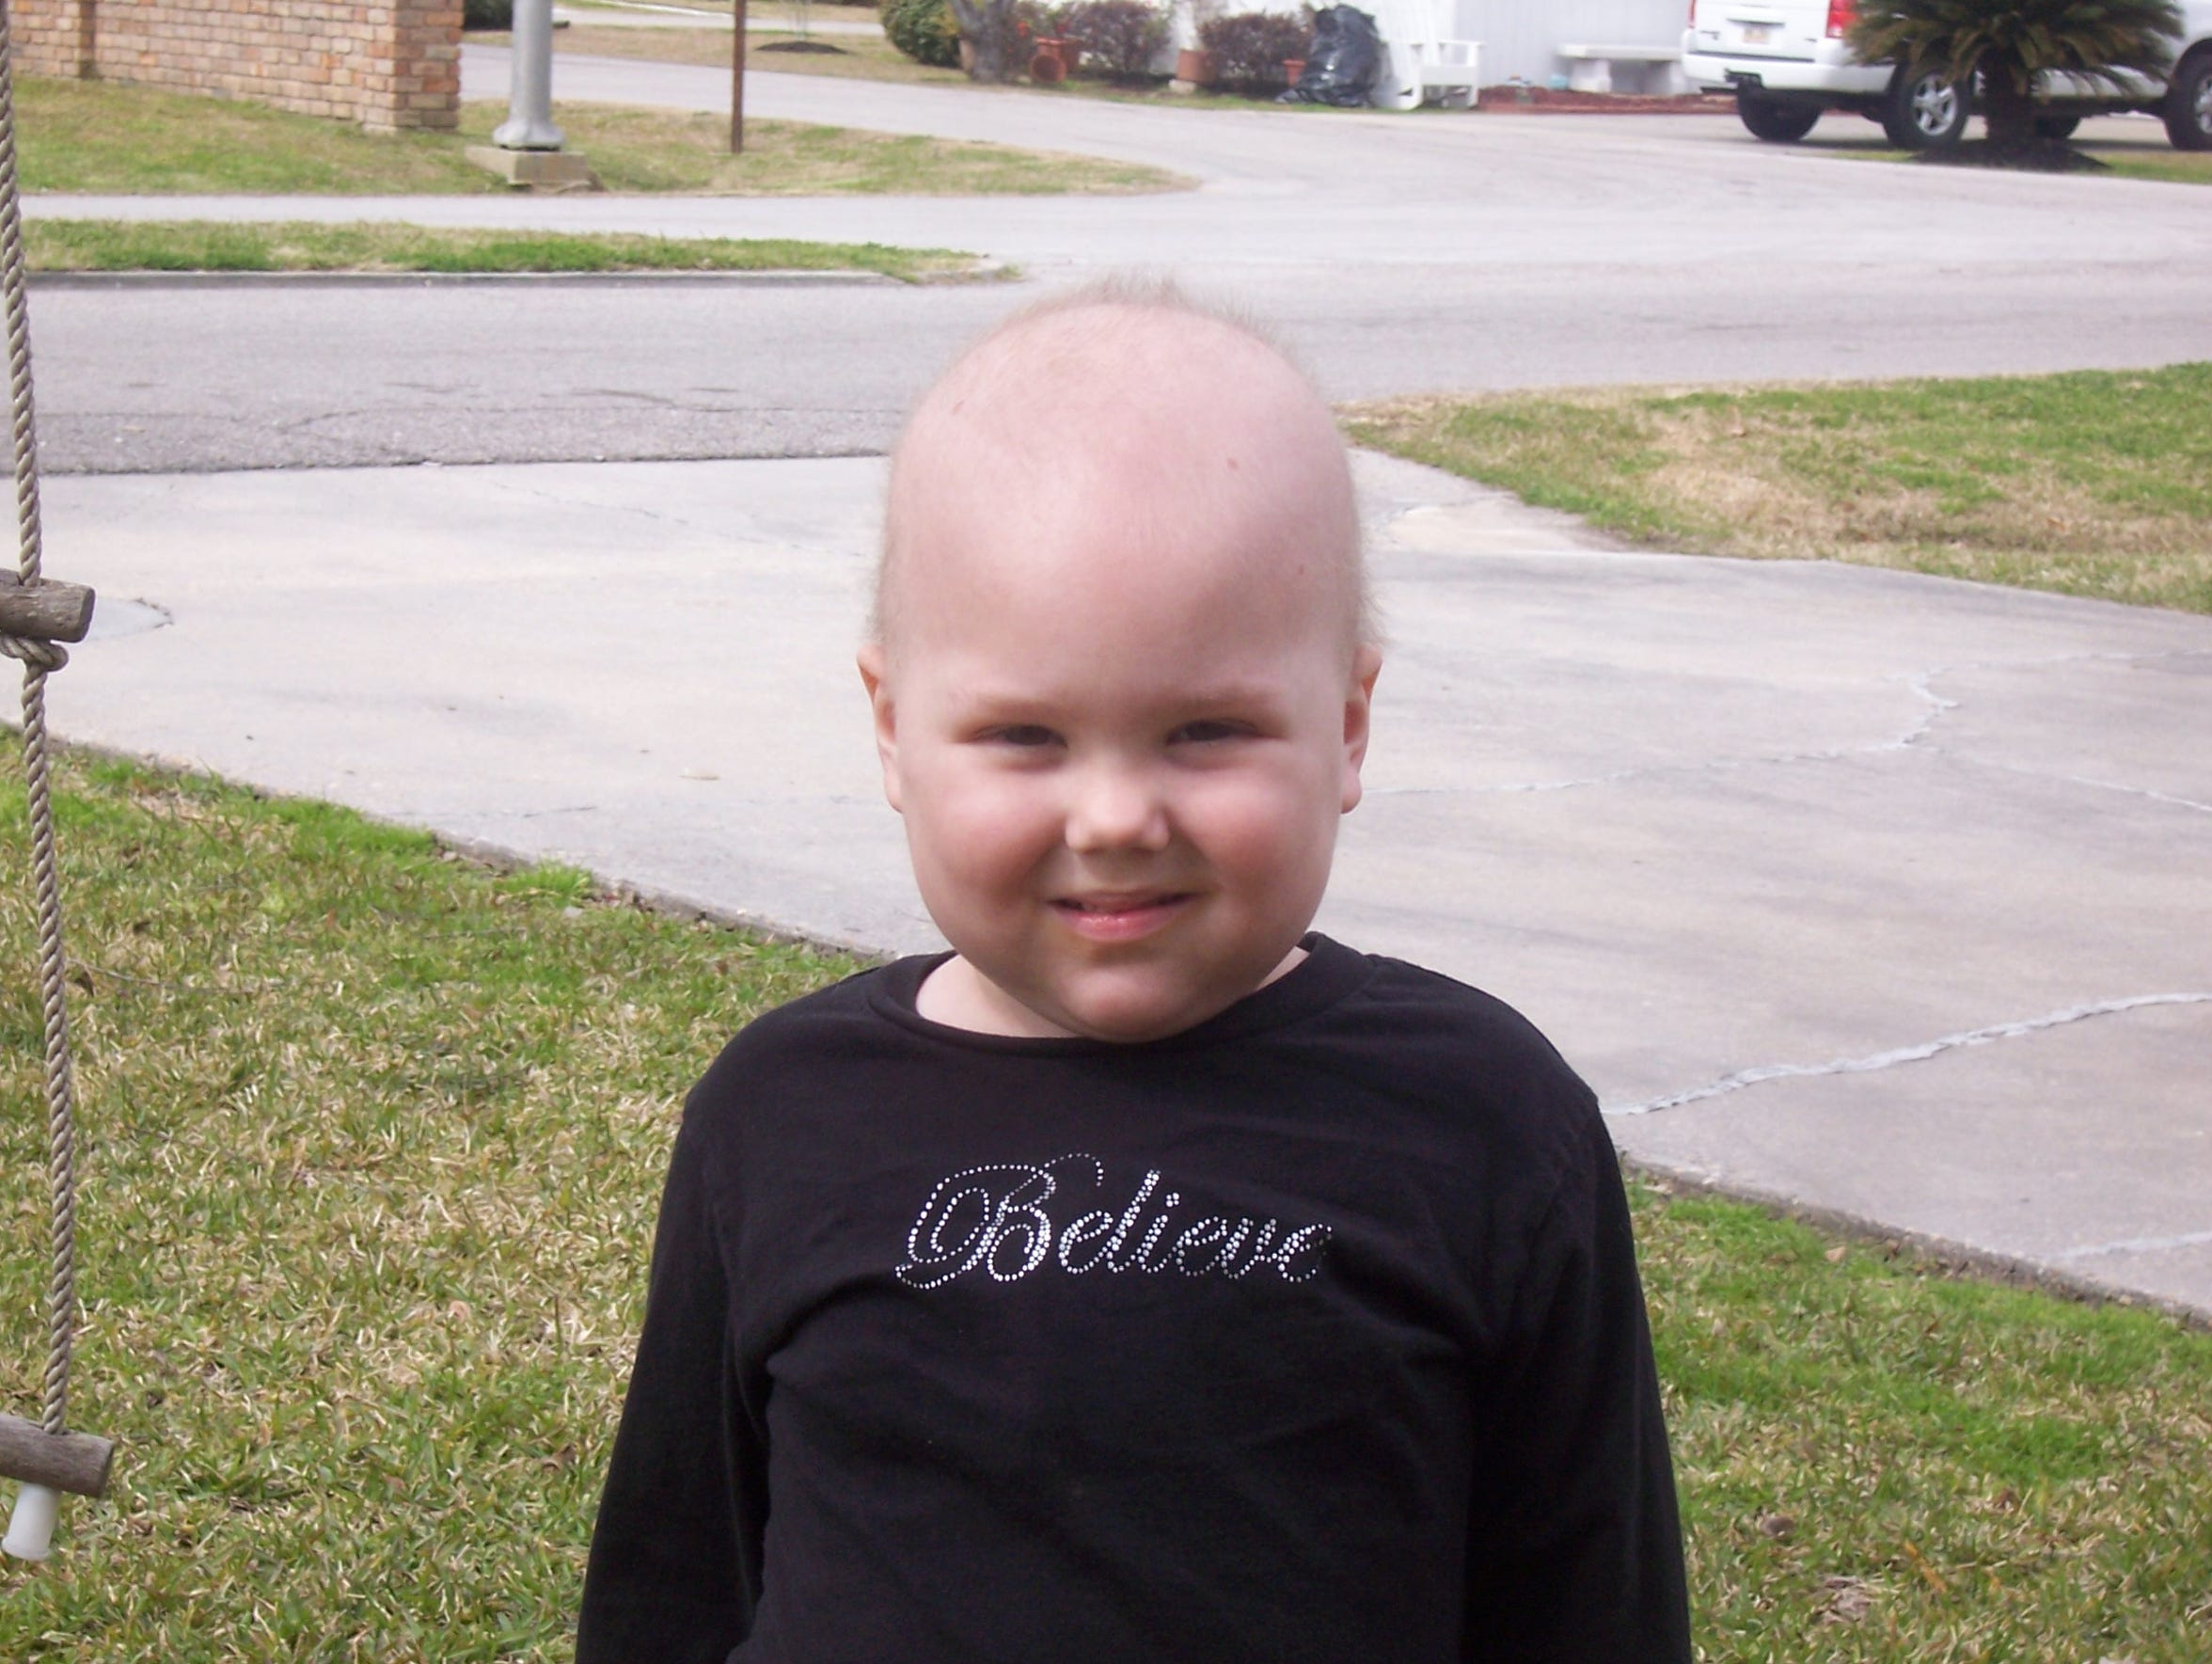 Kacie Francois was diagnosed with leukemia at age 3.